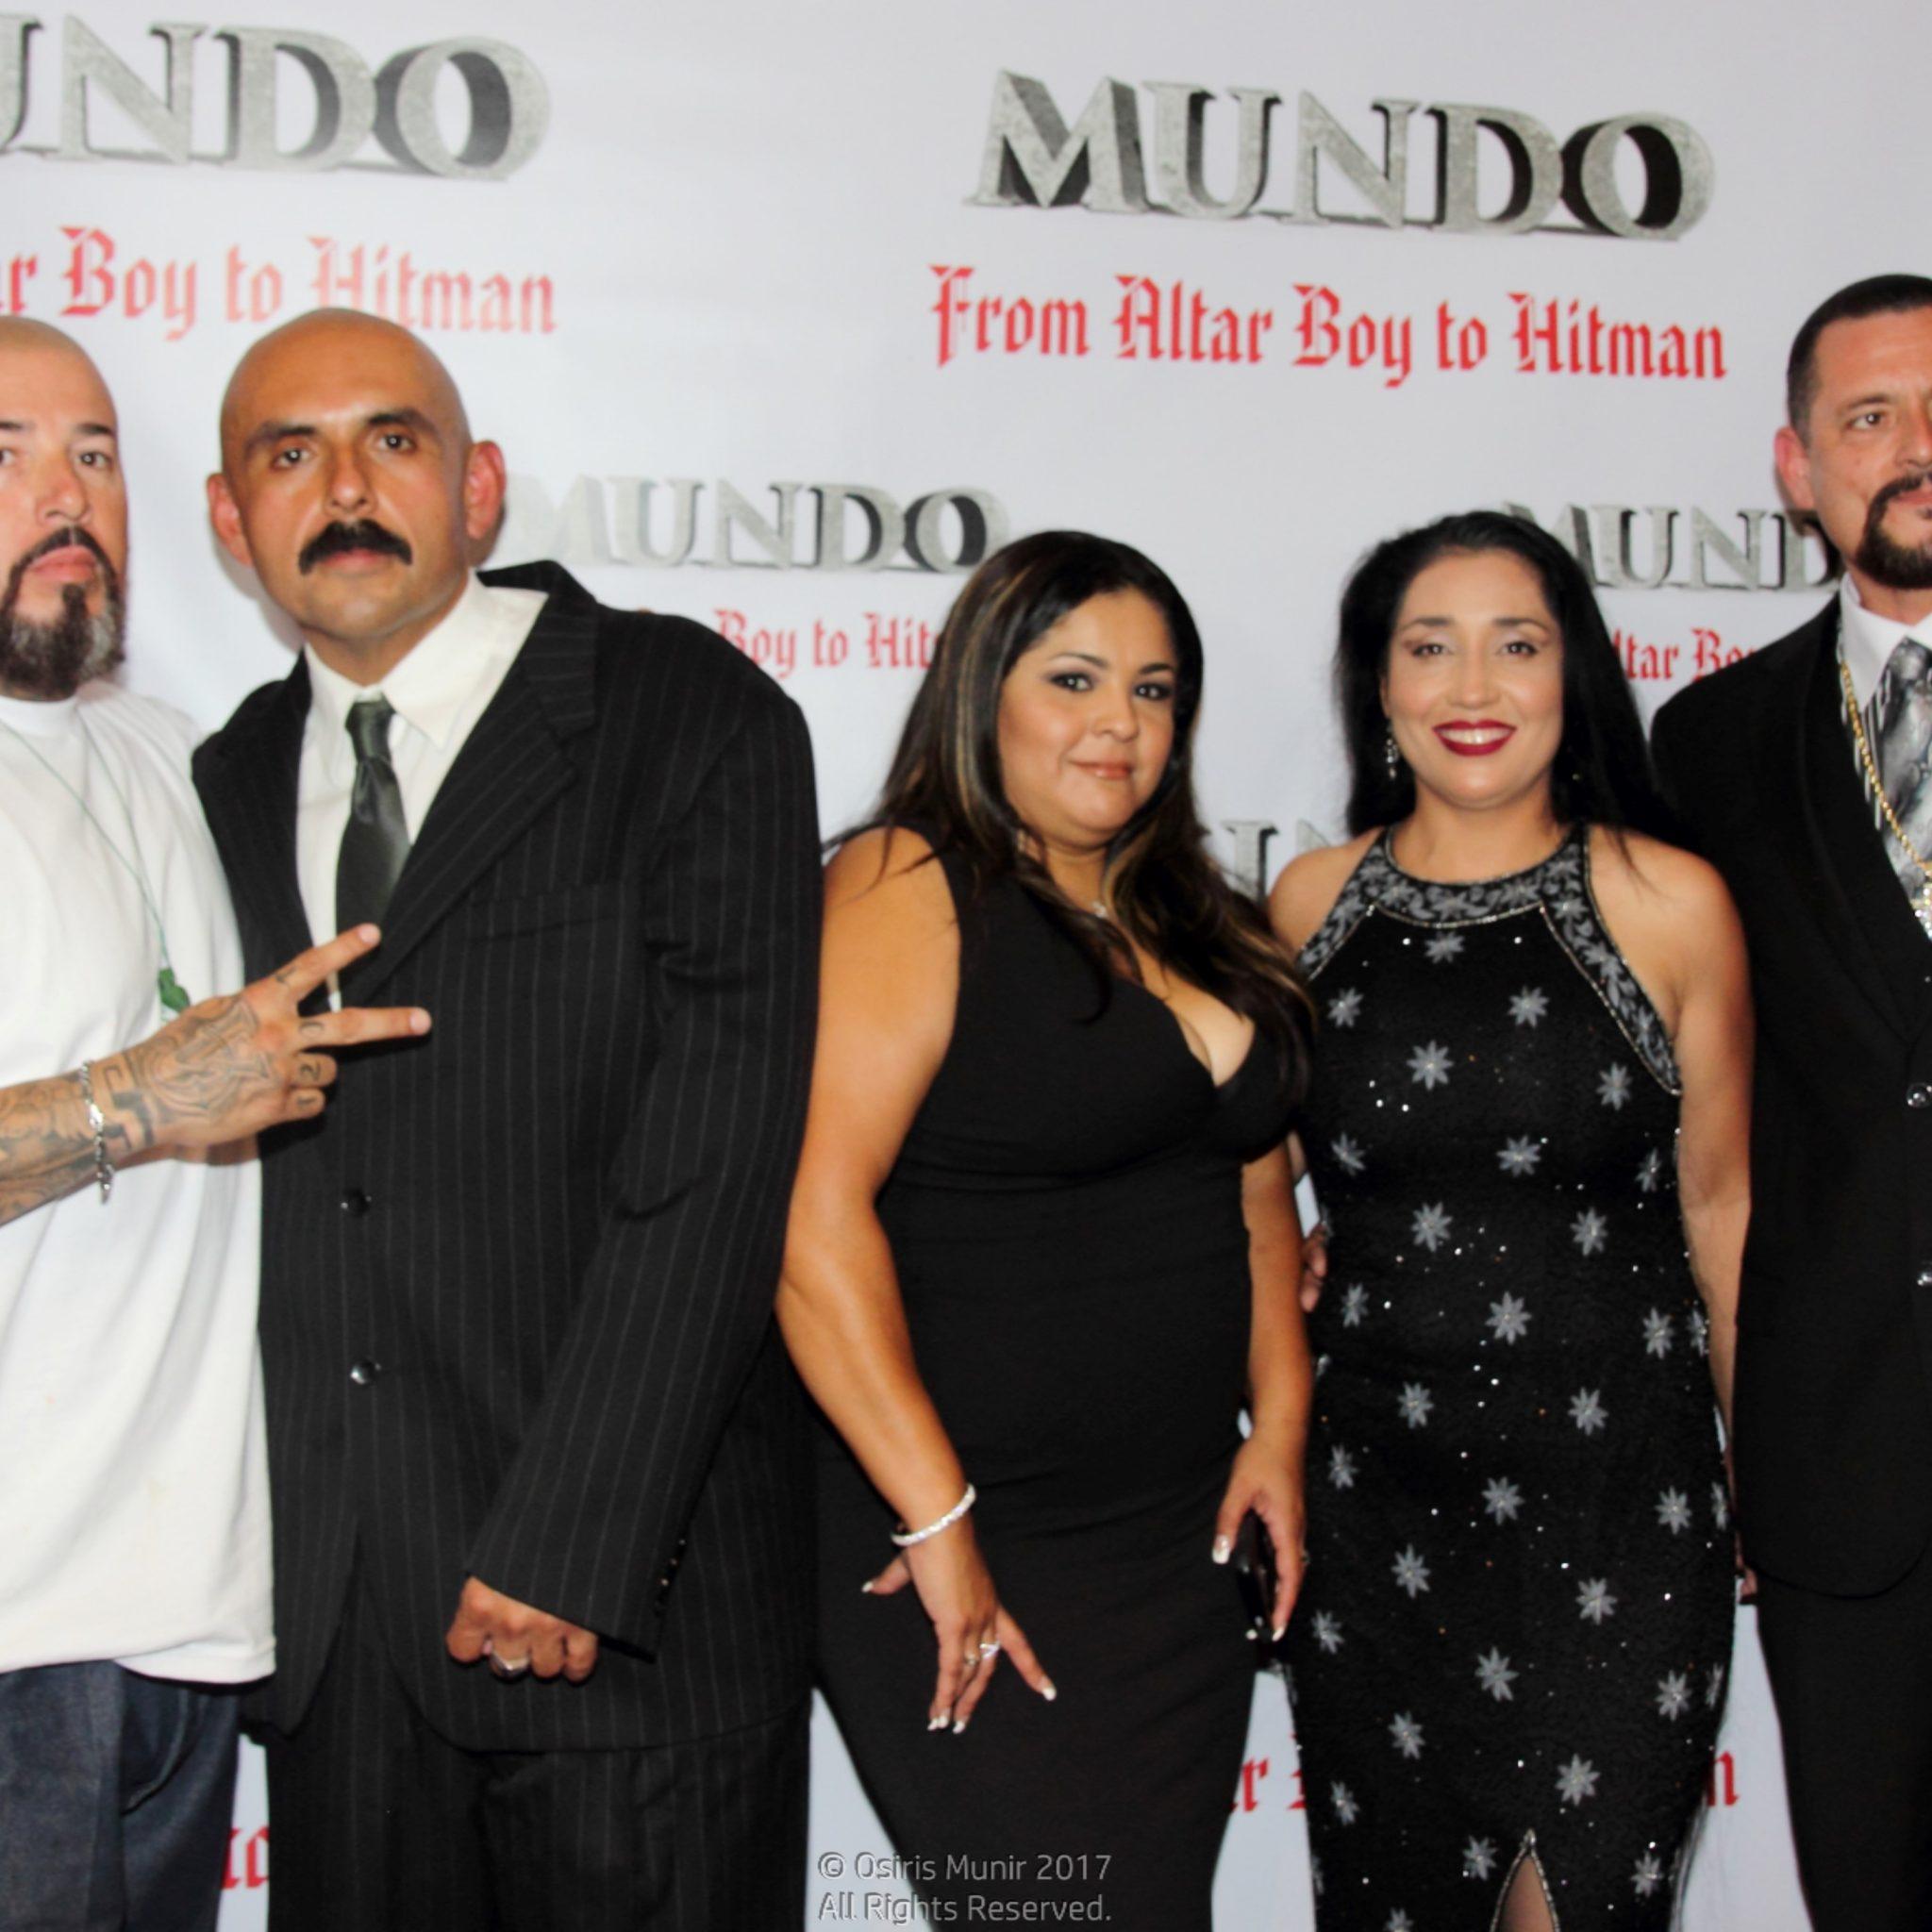 MUNDO/The True Story of Ramon Mendoza's Ascent from Altar